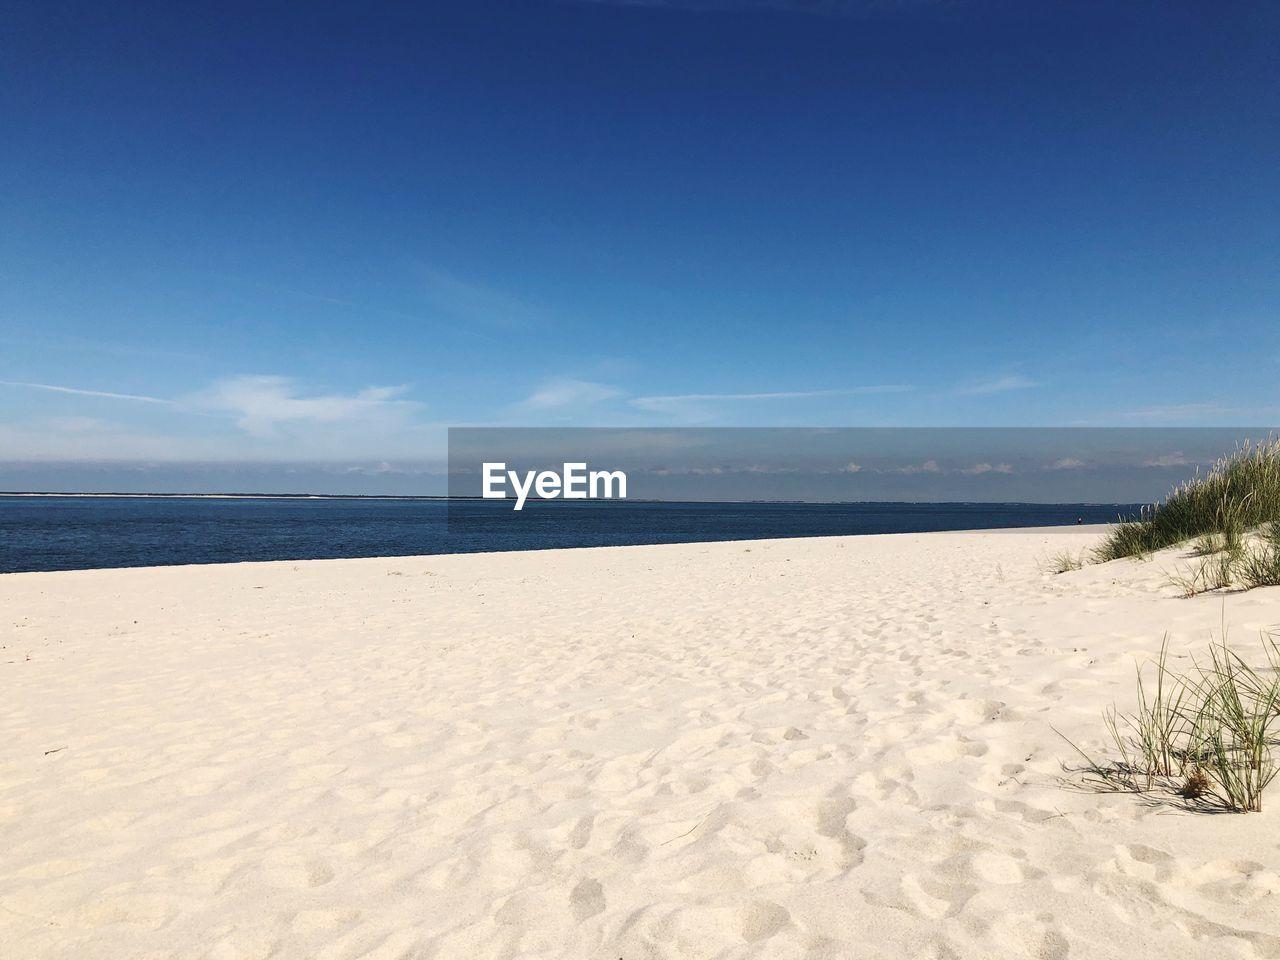 sky, land, beach, sand, tranquility, beauty in nature, scenics - nature, tranquil scene, horizon, sea, horizon over water, nature, blue, day, no people, water, non-urban scene, cloud - sky, idyllic, marram grass